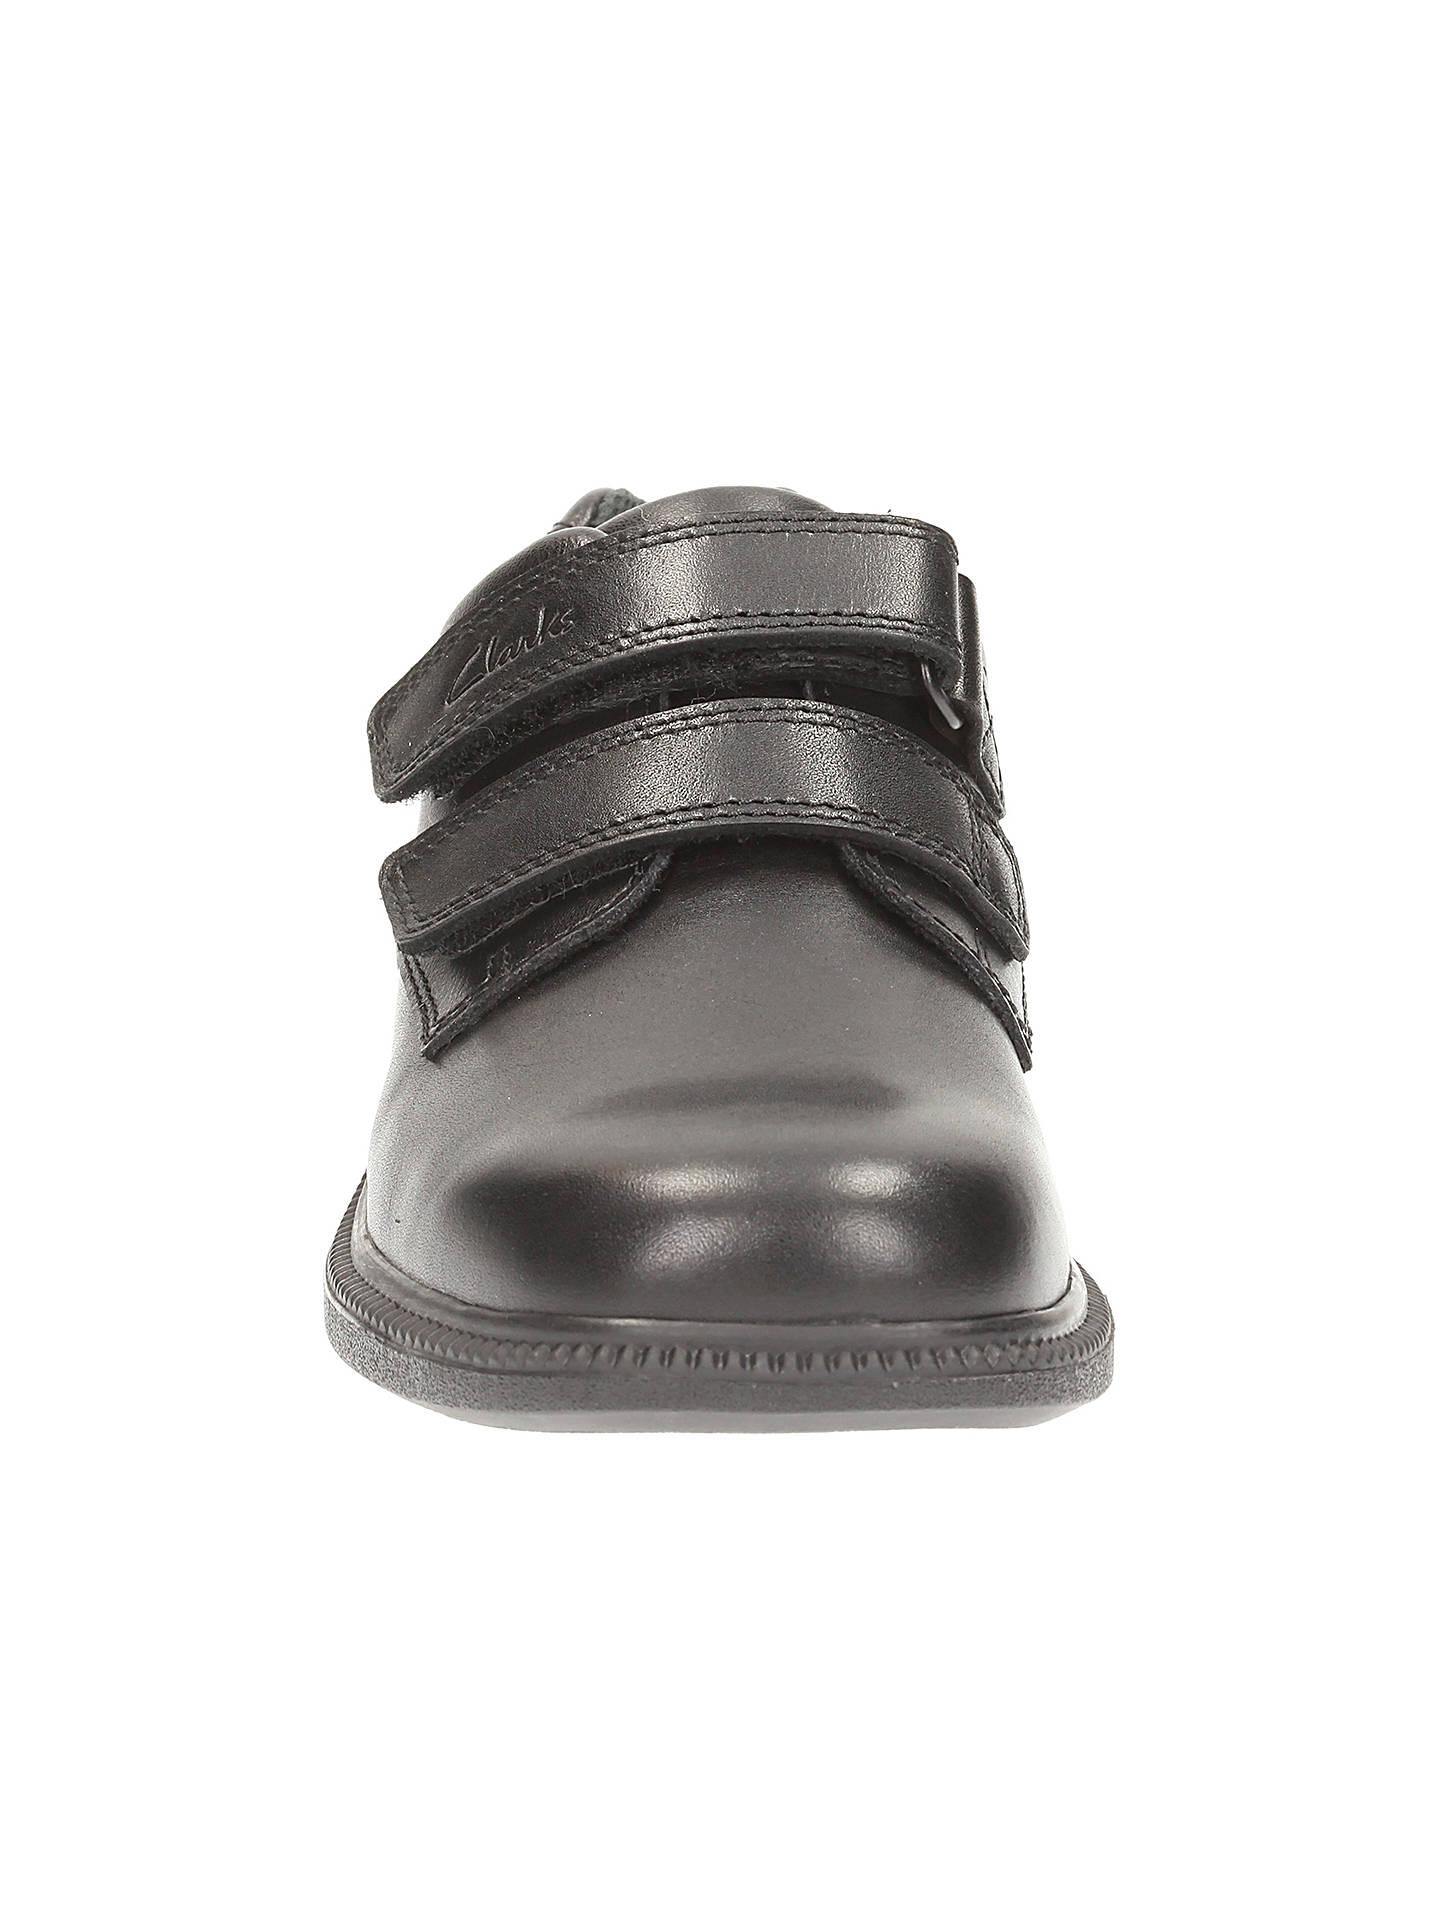 Boys Clarks Black Leather School Shoe Deaton